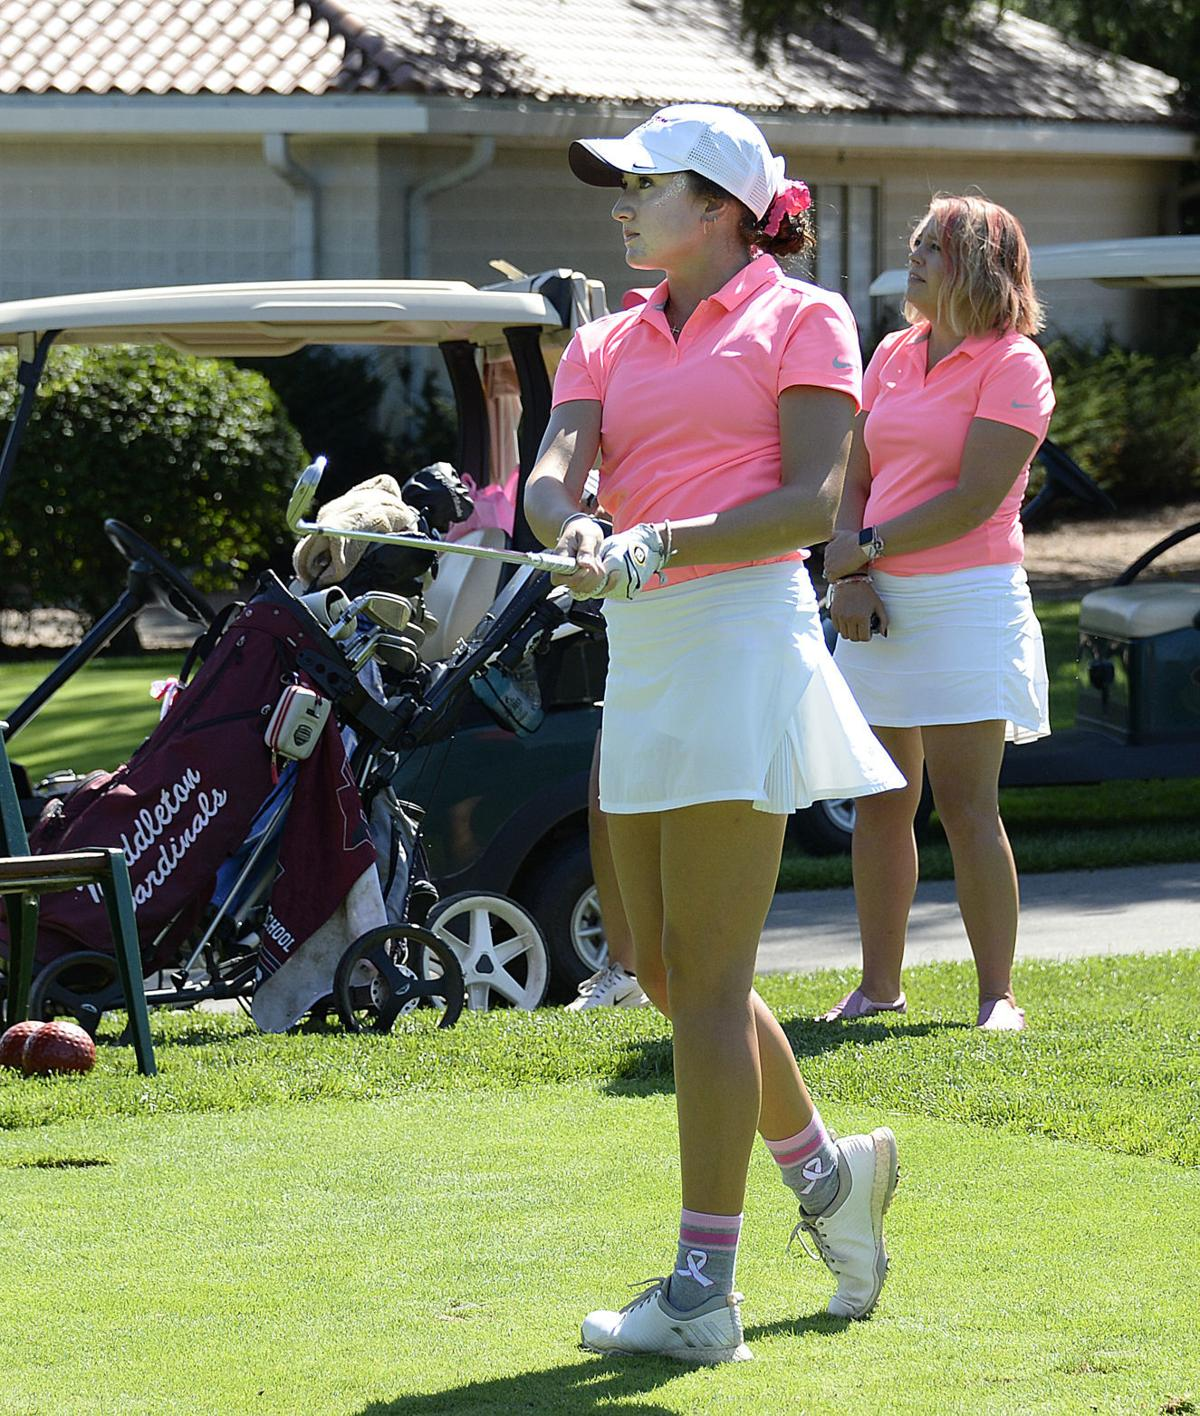 golf jump page photo 9-17